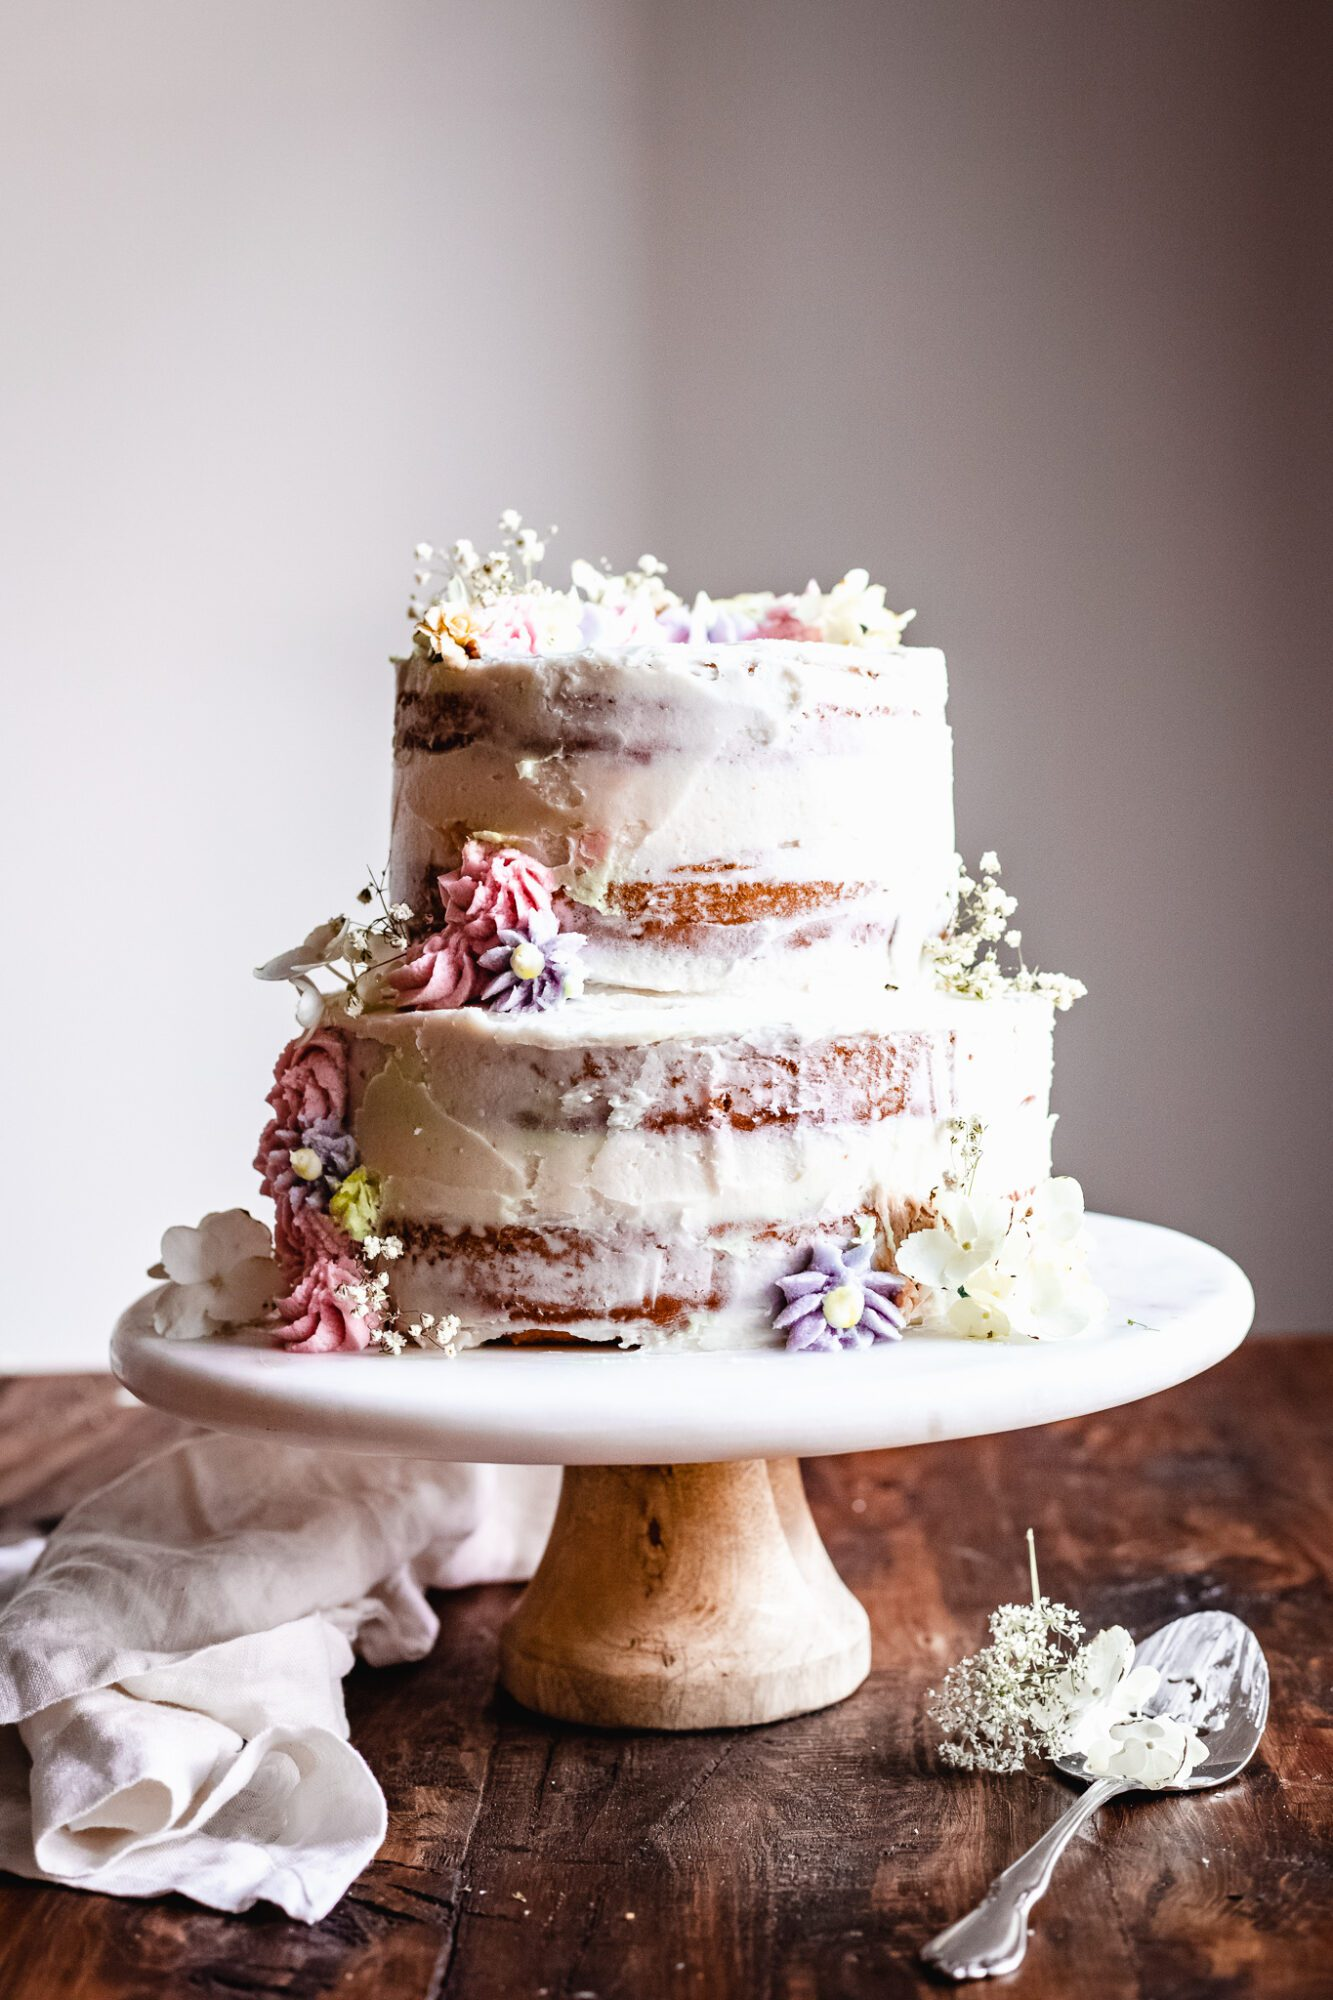 Homemade Vegan Wedding Cake Recipe The Banana Diaries